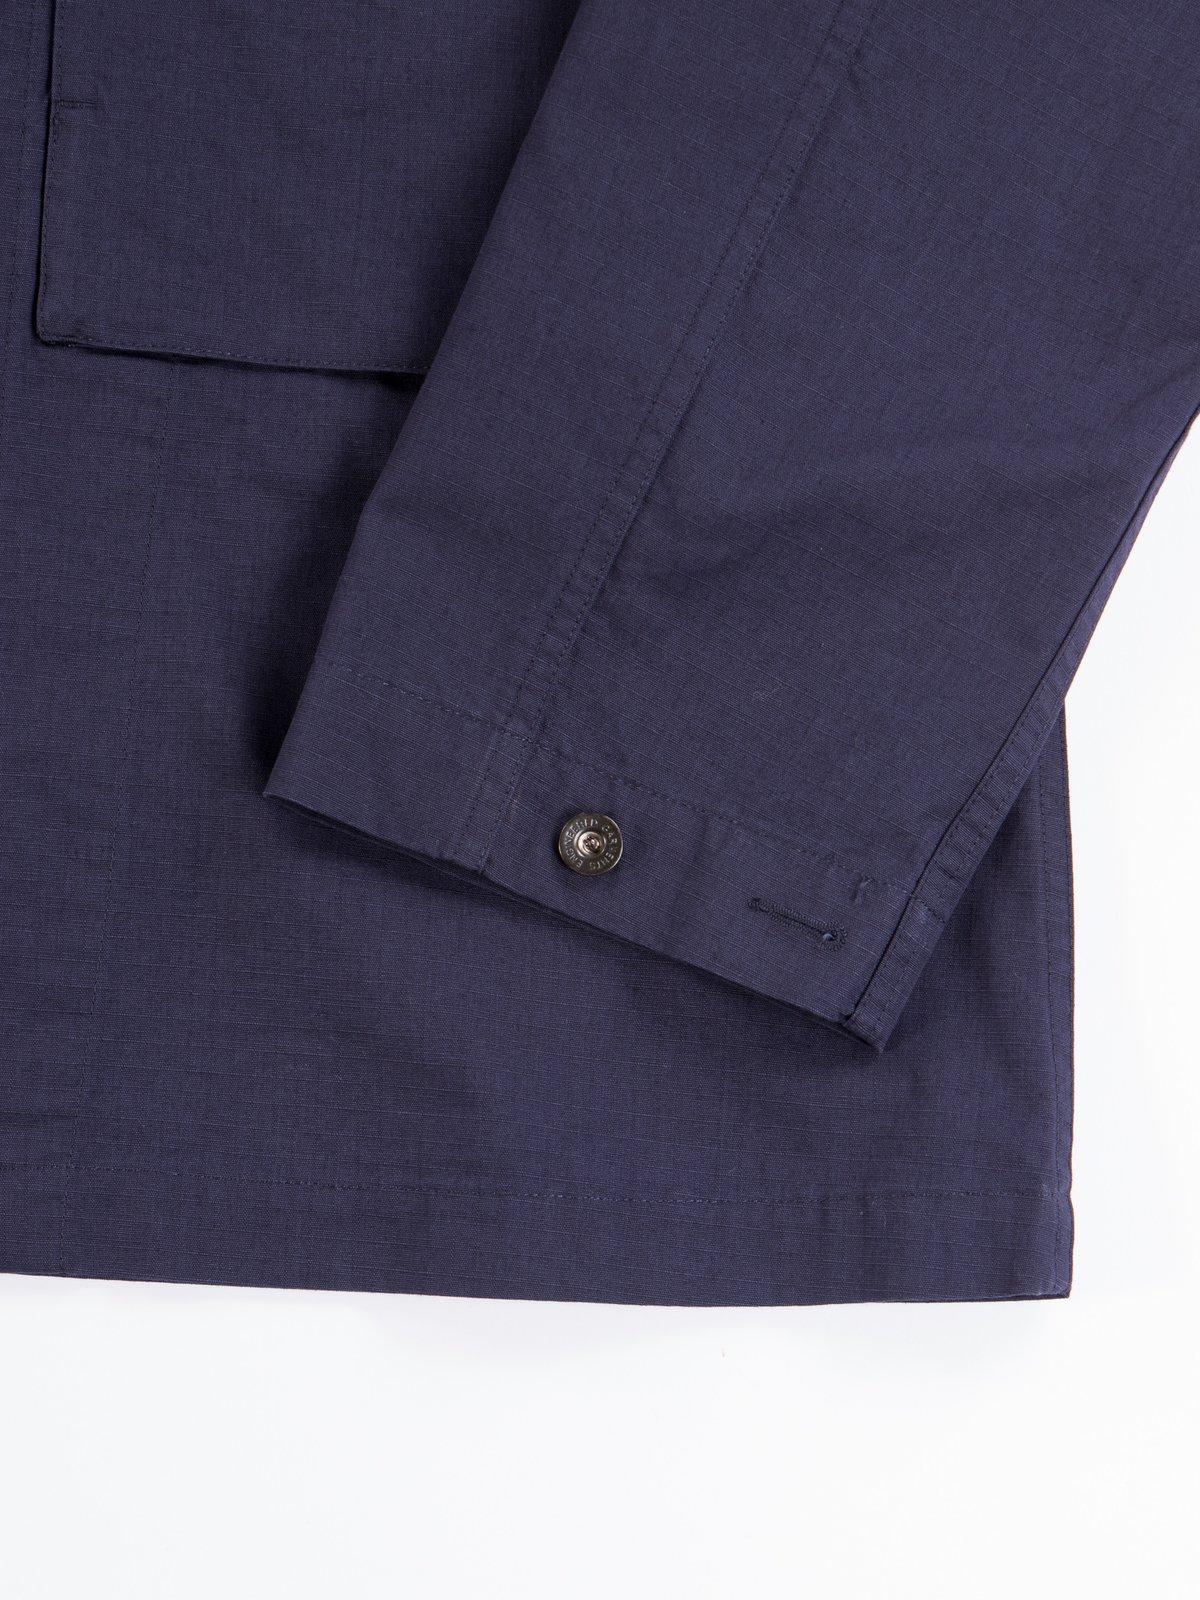 Dark Navy Cotton Ripstop M43/2 Shirt Jacket - Image 5